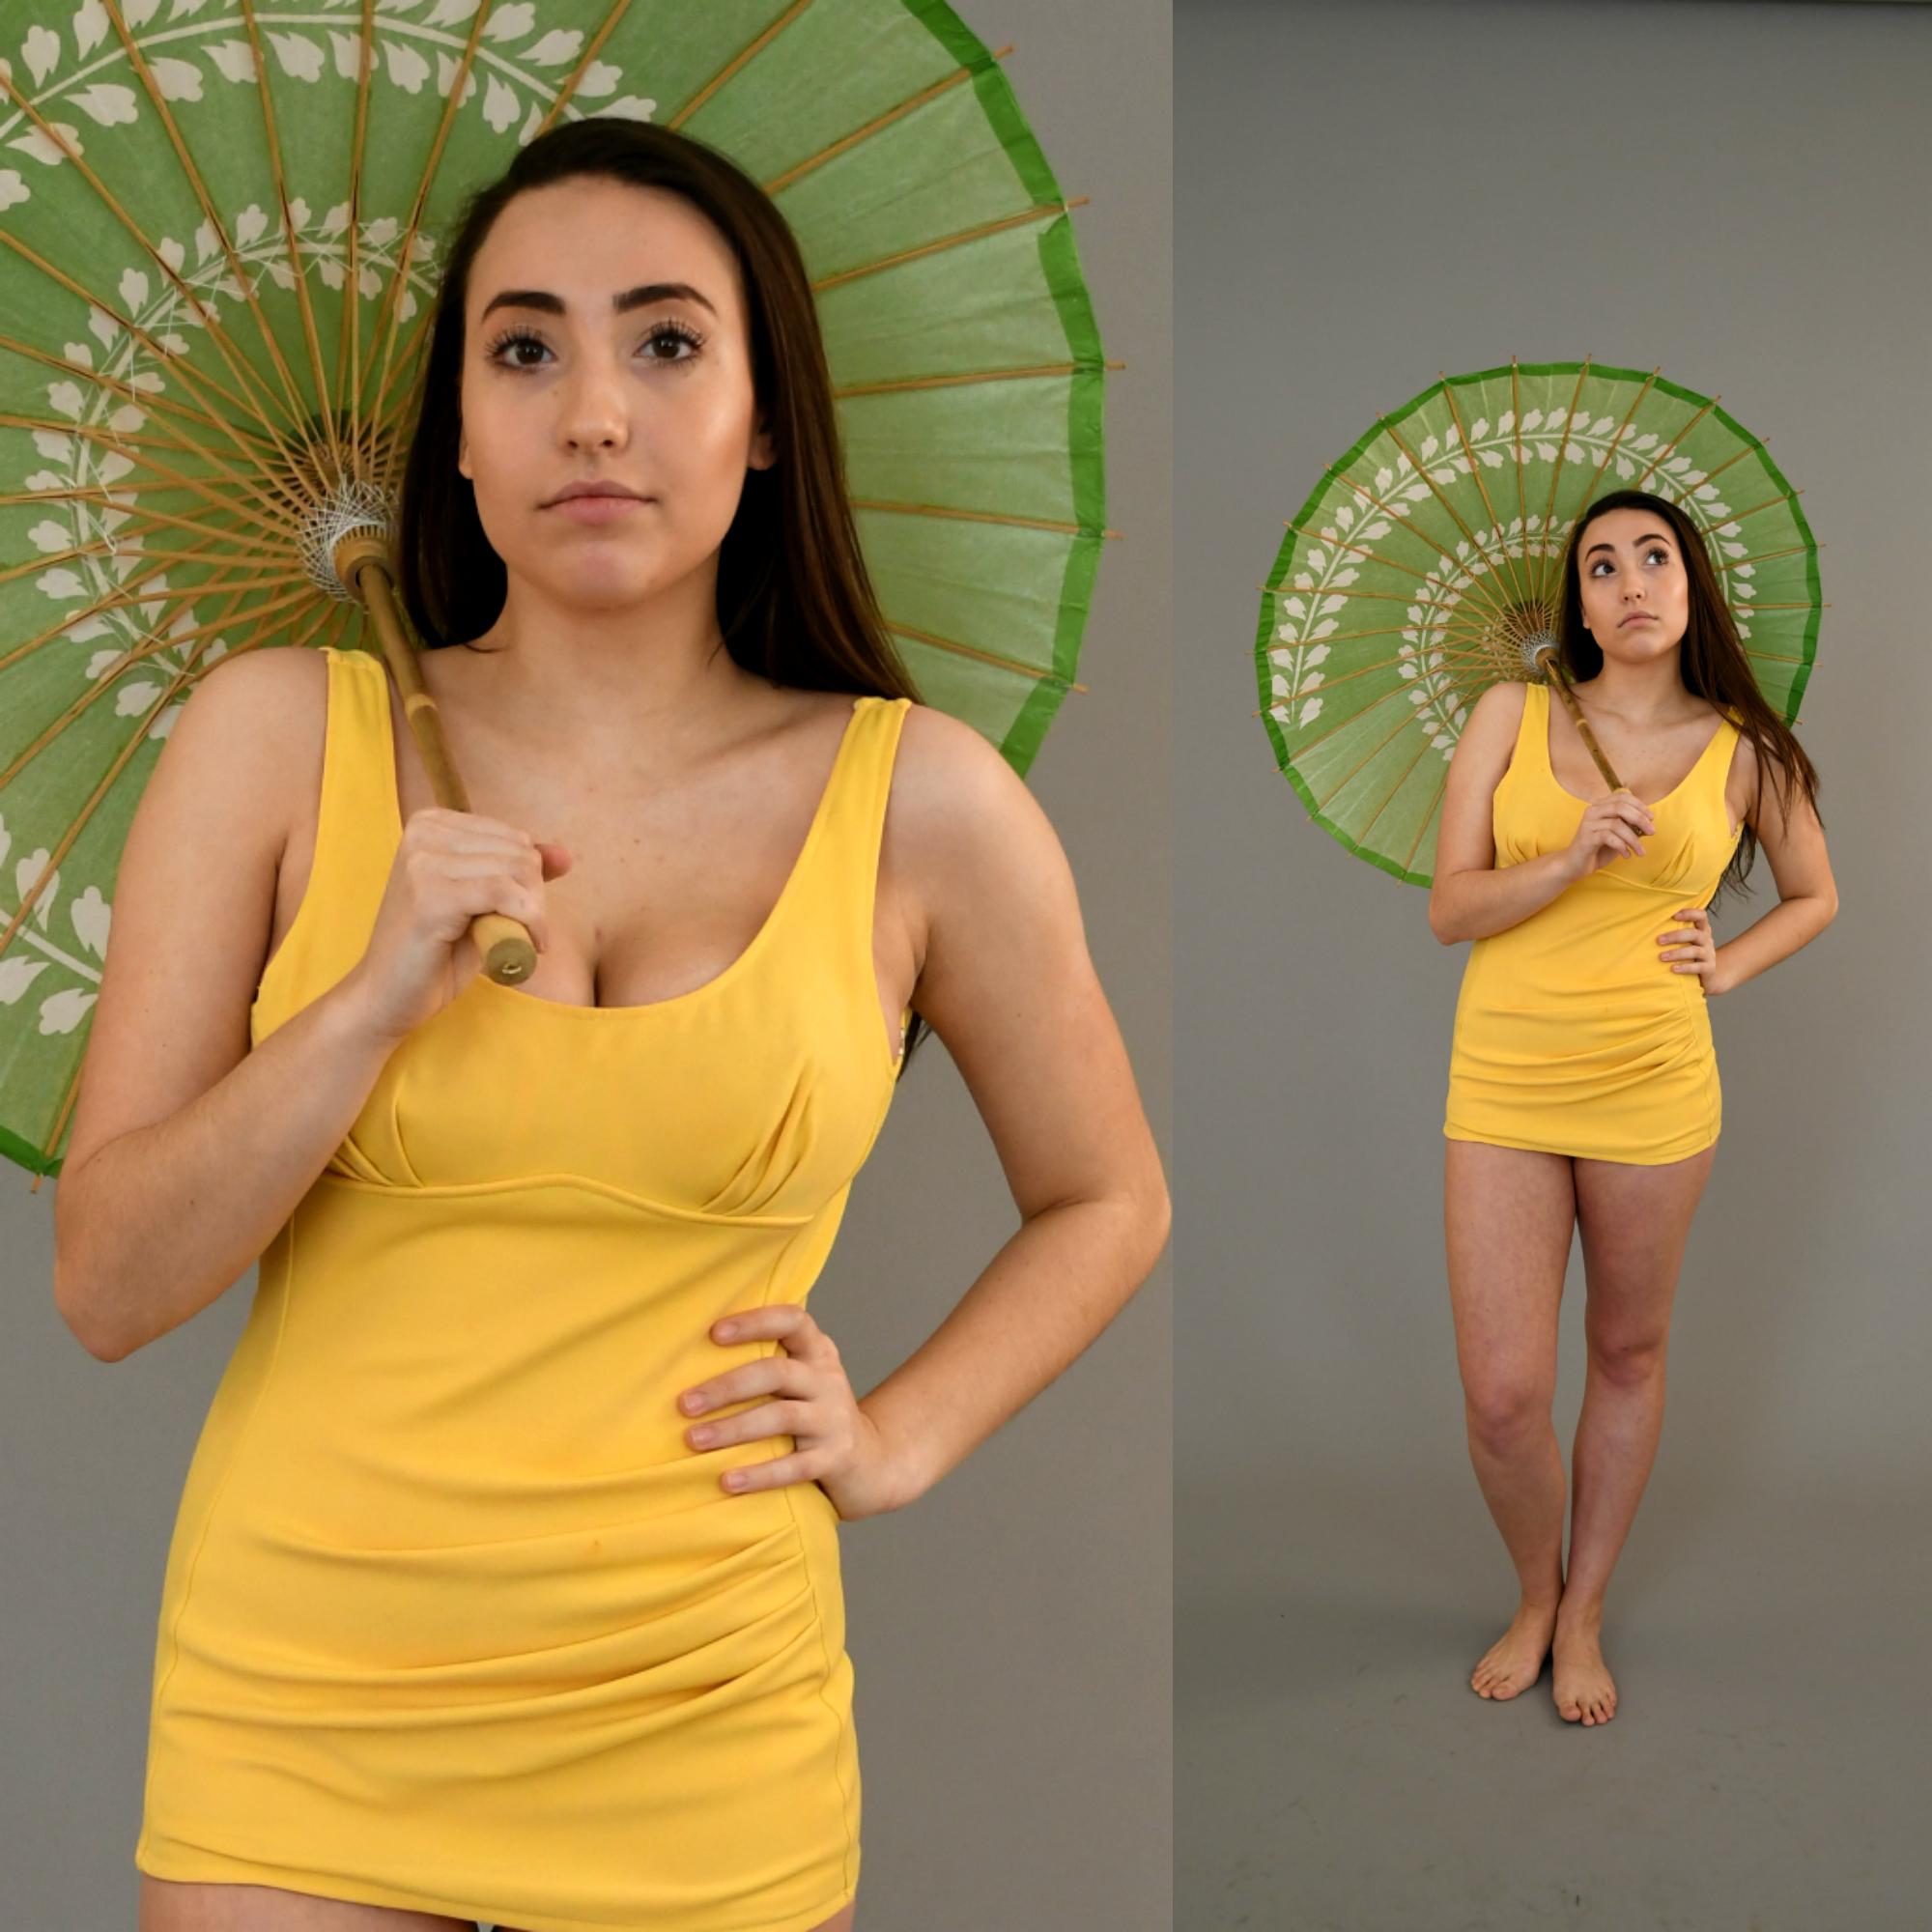 yellowswimsuit.jpg